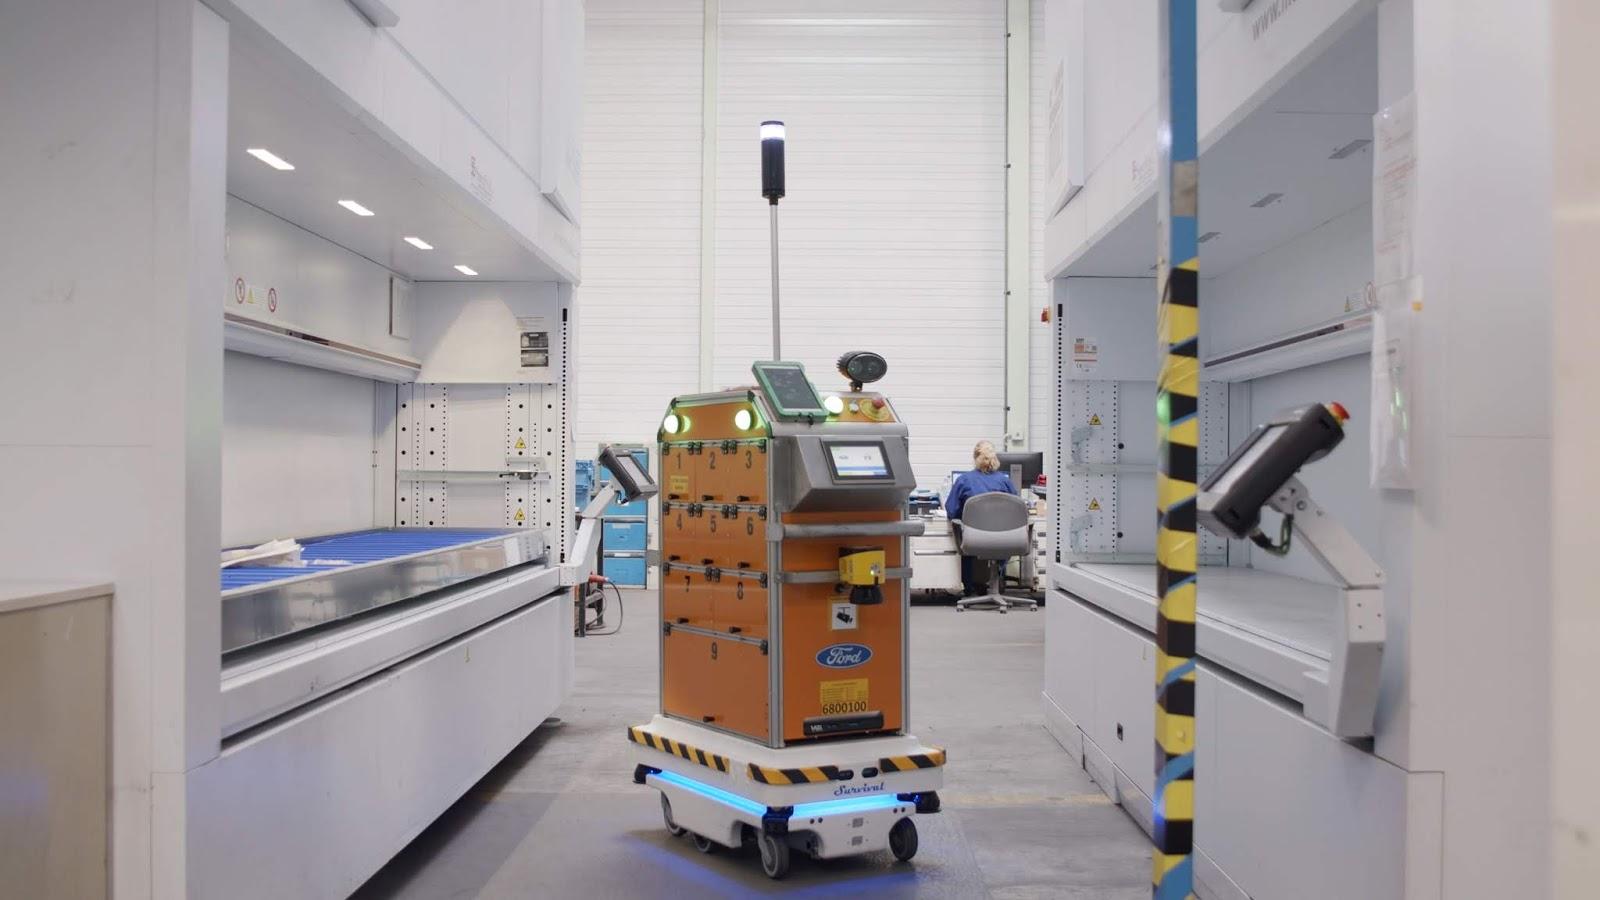 Ford SelfDrivingRobot 1 Η Ford έφτιαξε ένα ρομπότ για τις χαμαλοδουλειές του εργοστασίου της! Ford, video, videos, Εργοστάσιο, Τεχνολογία